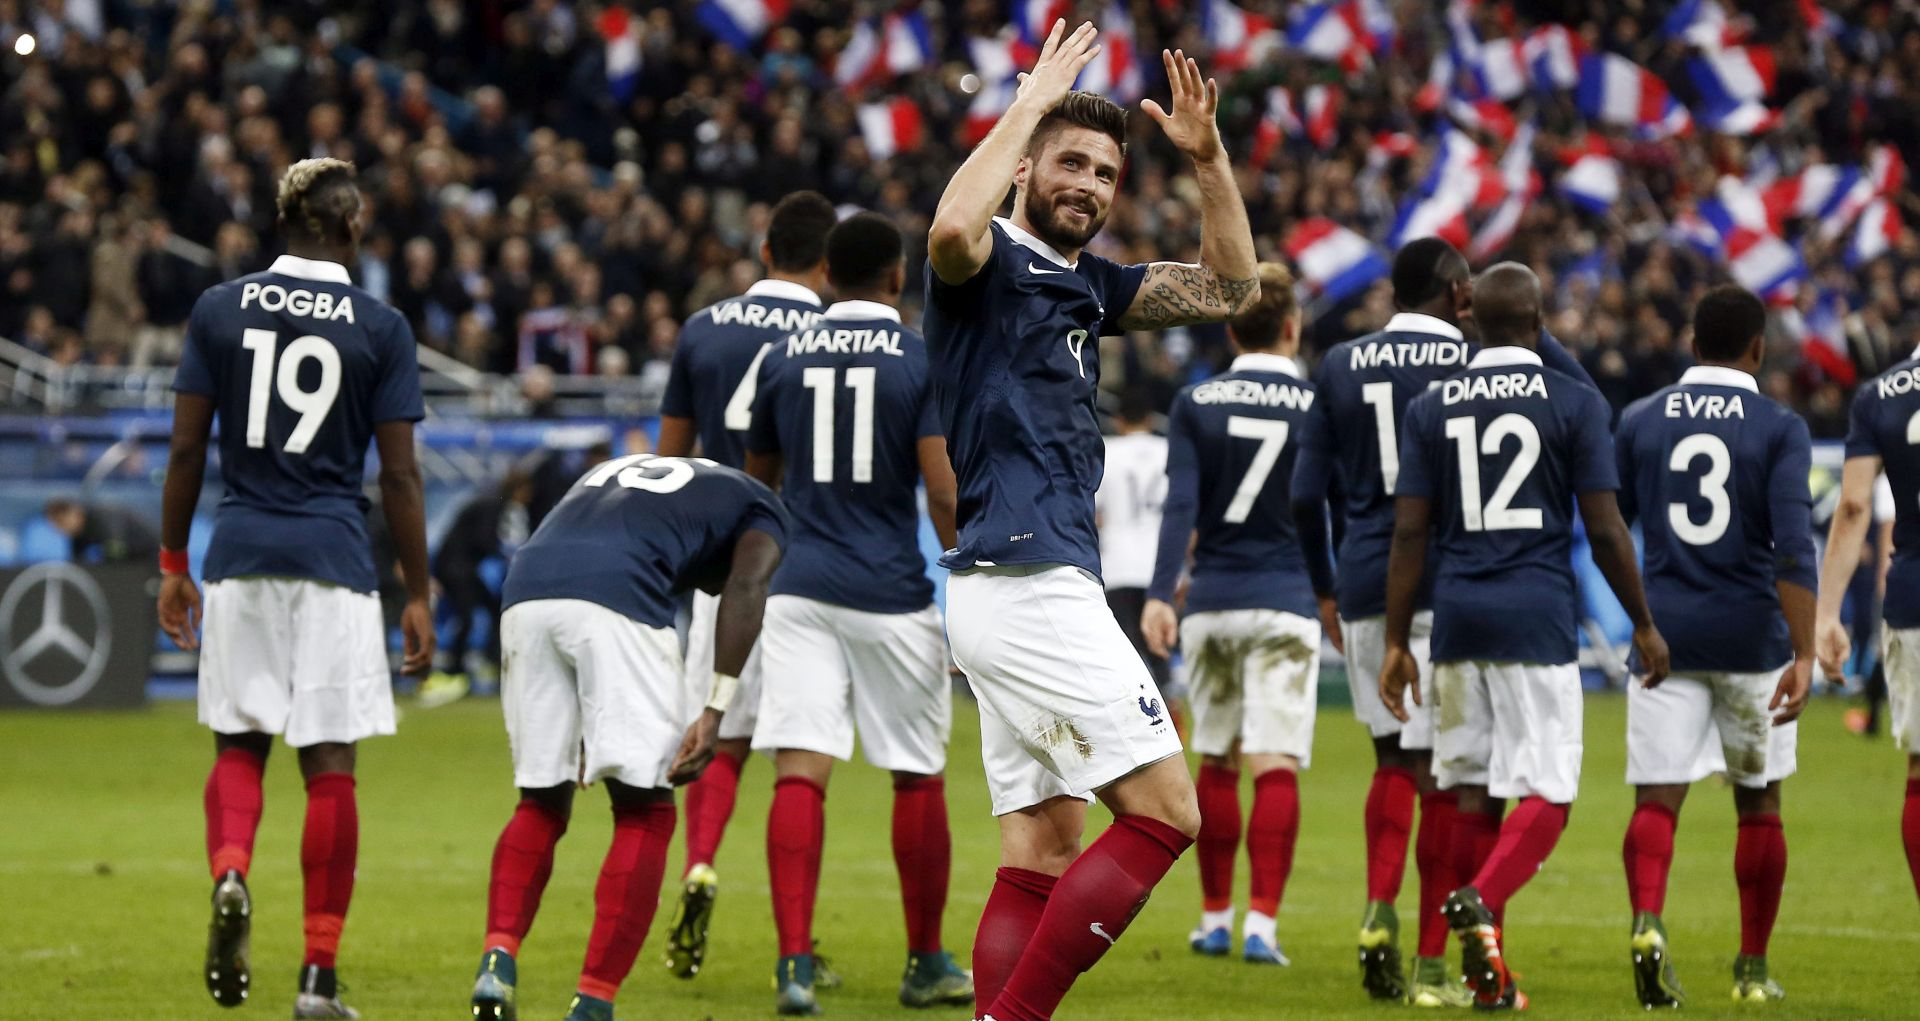 ROY HODGSON Pozdravljam odluku da se odigra utakmica na Wembleyju, pokazat ćemo solidarnost s Francuzima